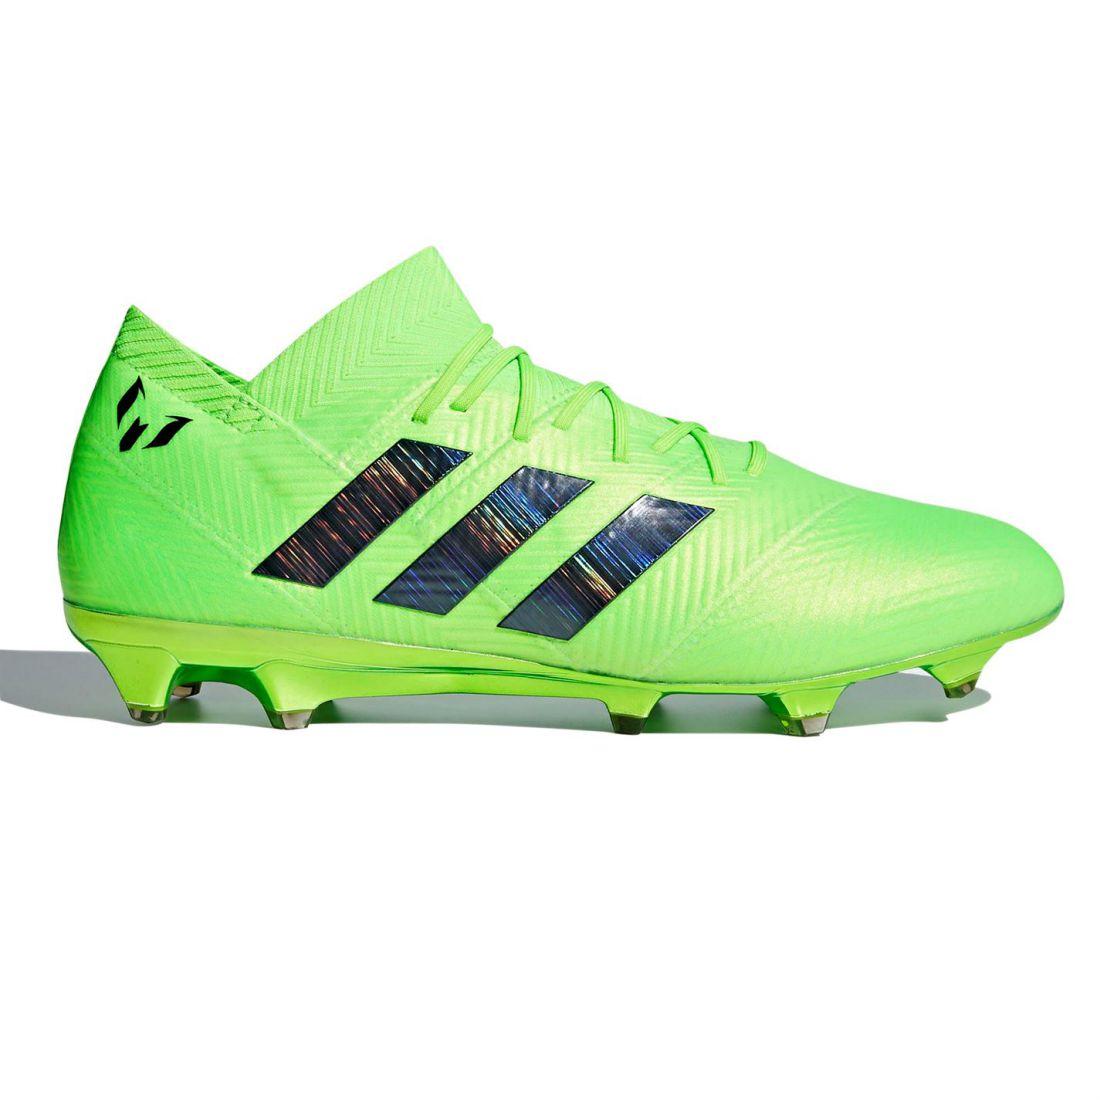 f7b4435c641 adidas Nemeziz Messi 18.1 FG Football Boots Mens Gents Firm Ground ...